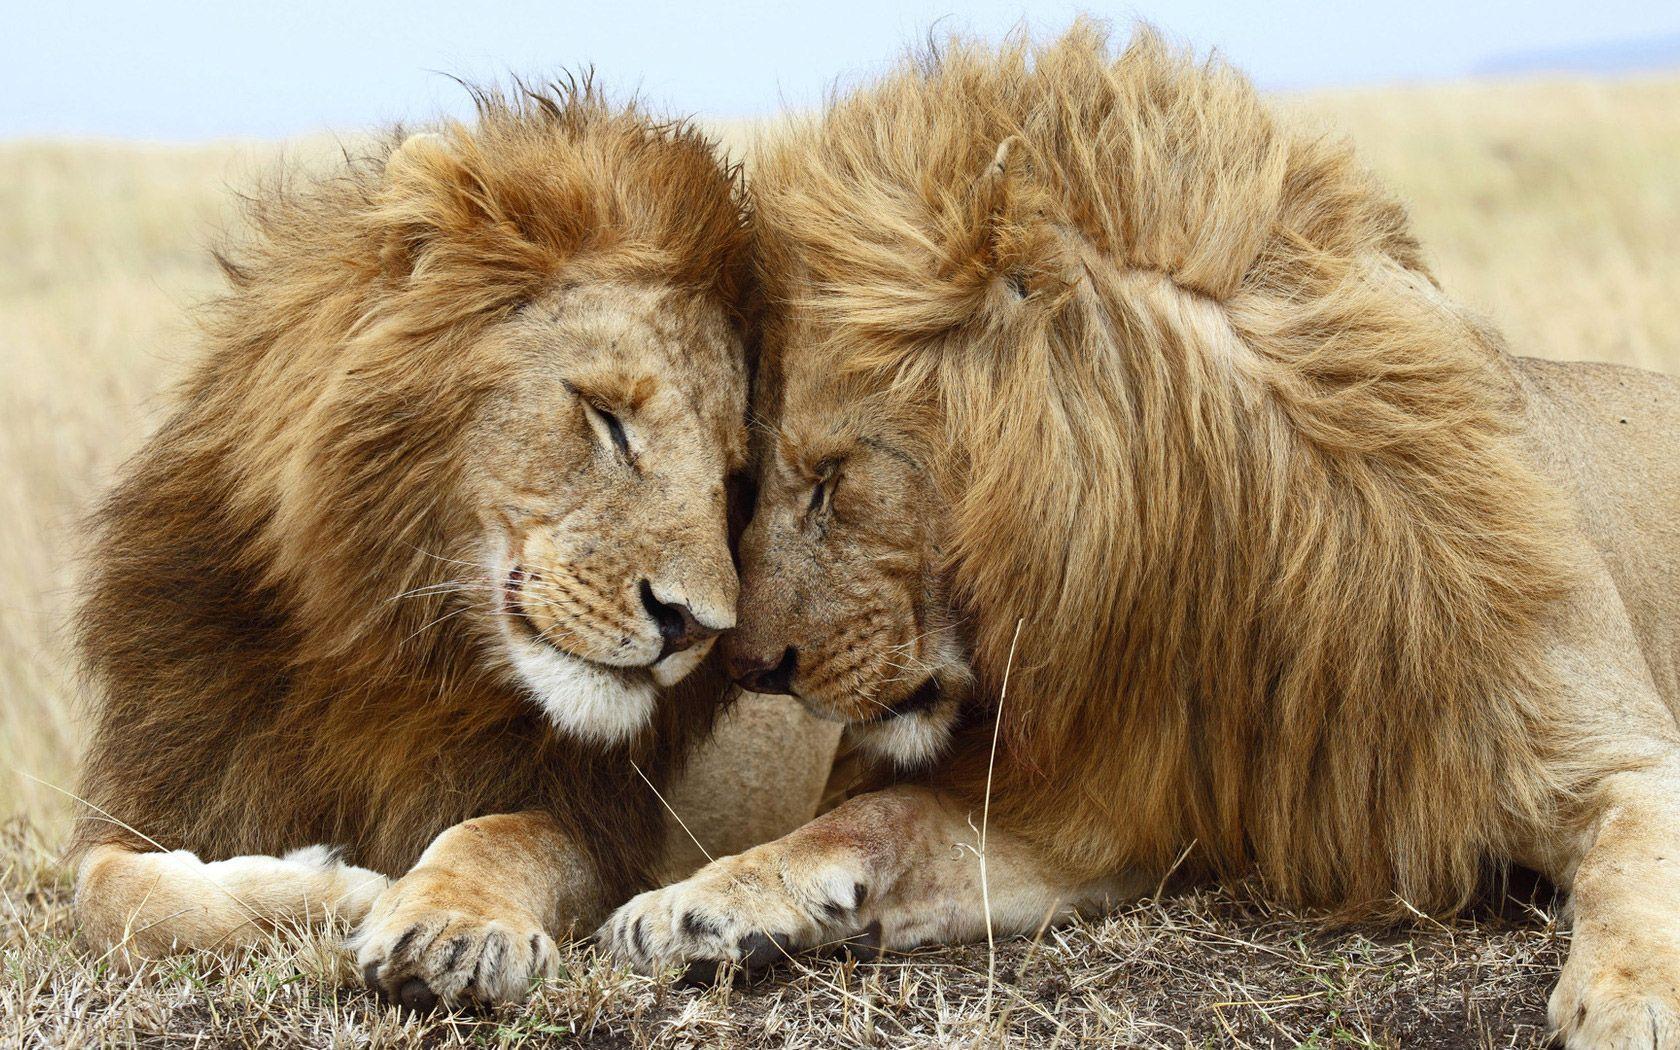 Animal - Lion Wallpaper | Chacha - Autora Anime | Pinterest ...